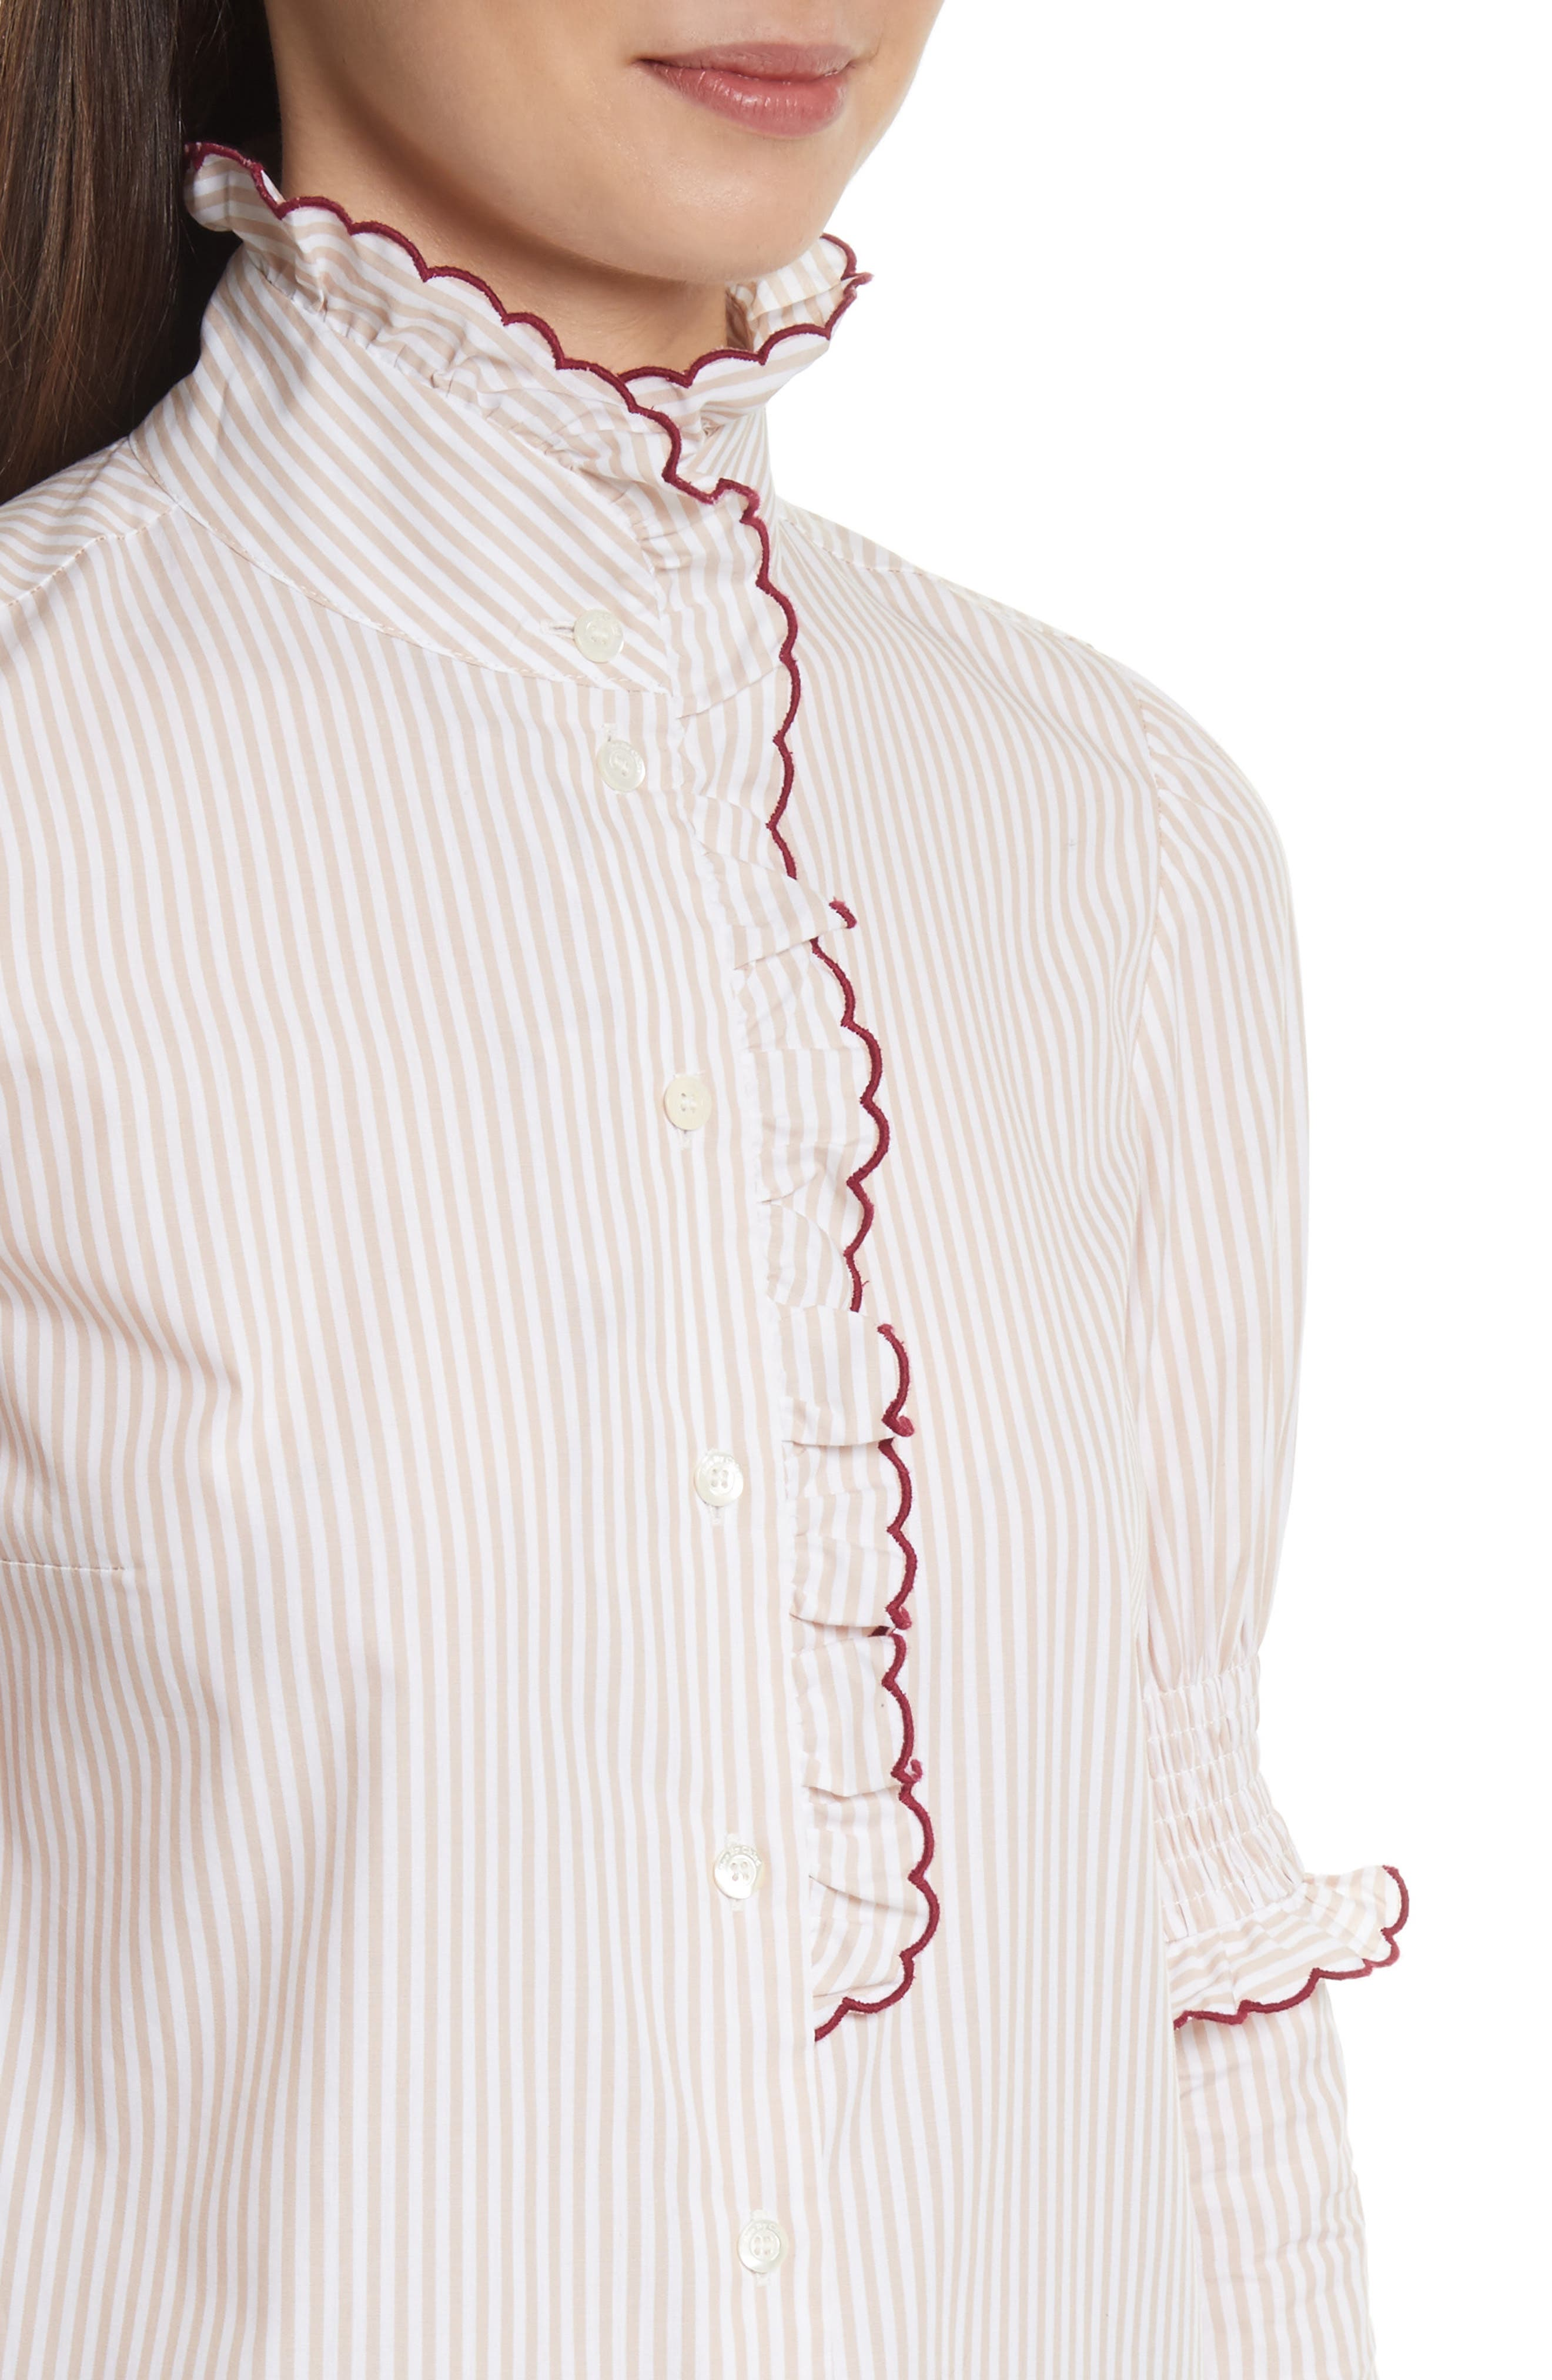 Stripe Cotton Shirt,                             Alternate thumbnail 4, color,                             250